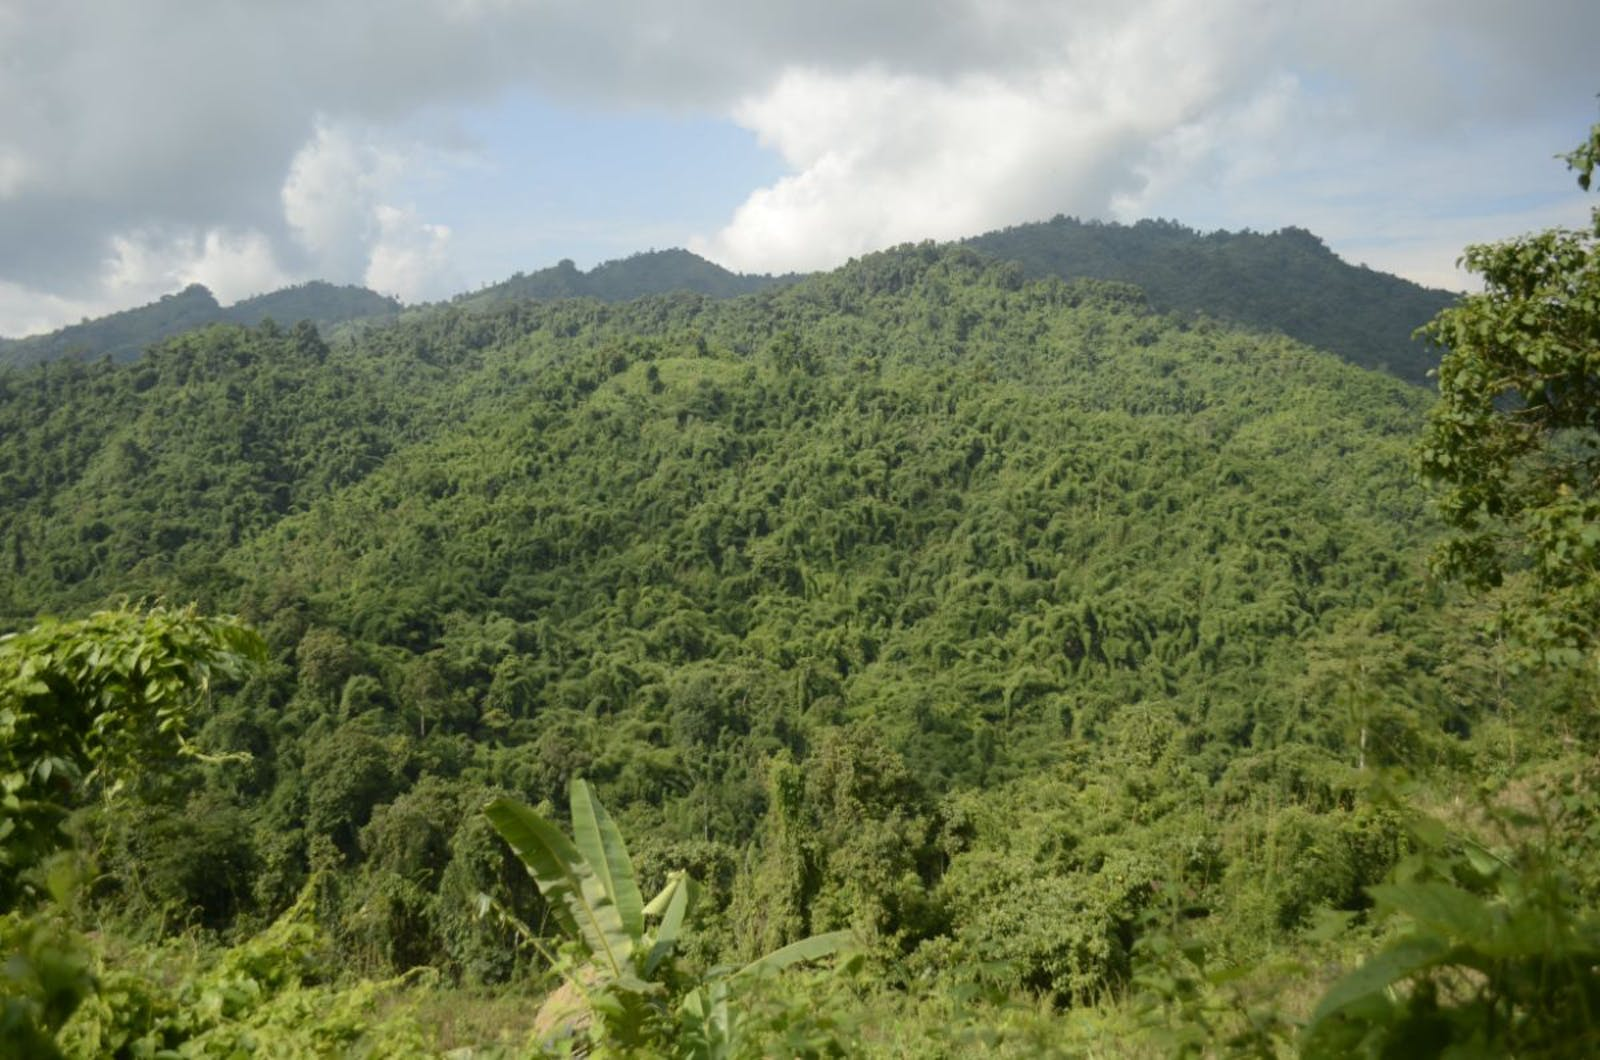 Mizoram-Manipur-Kachin Rainforests